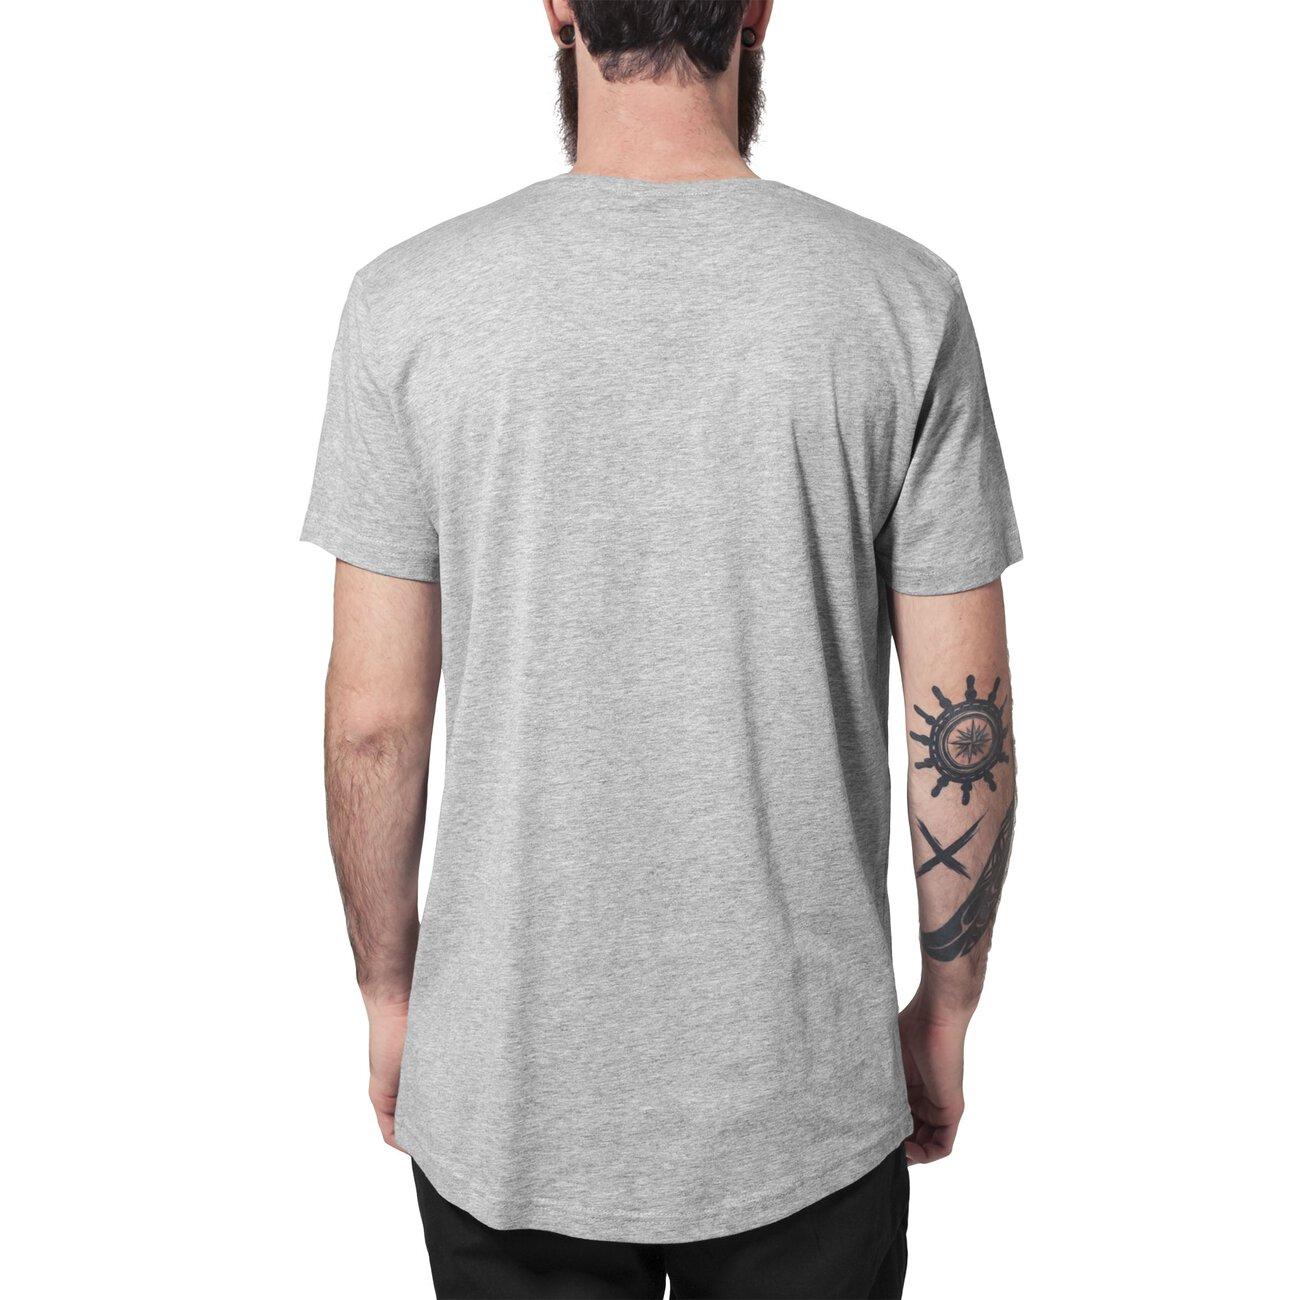 urban classics t shirt herren shaped long style kurzarm shirt tb 638. Black Bedroom Furniture Sets. Home Design Ideas